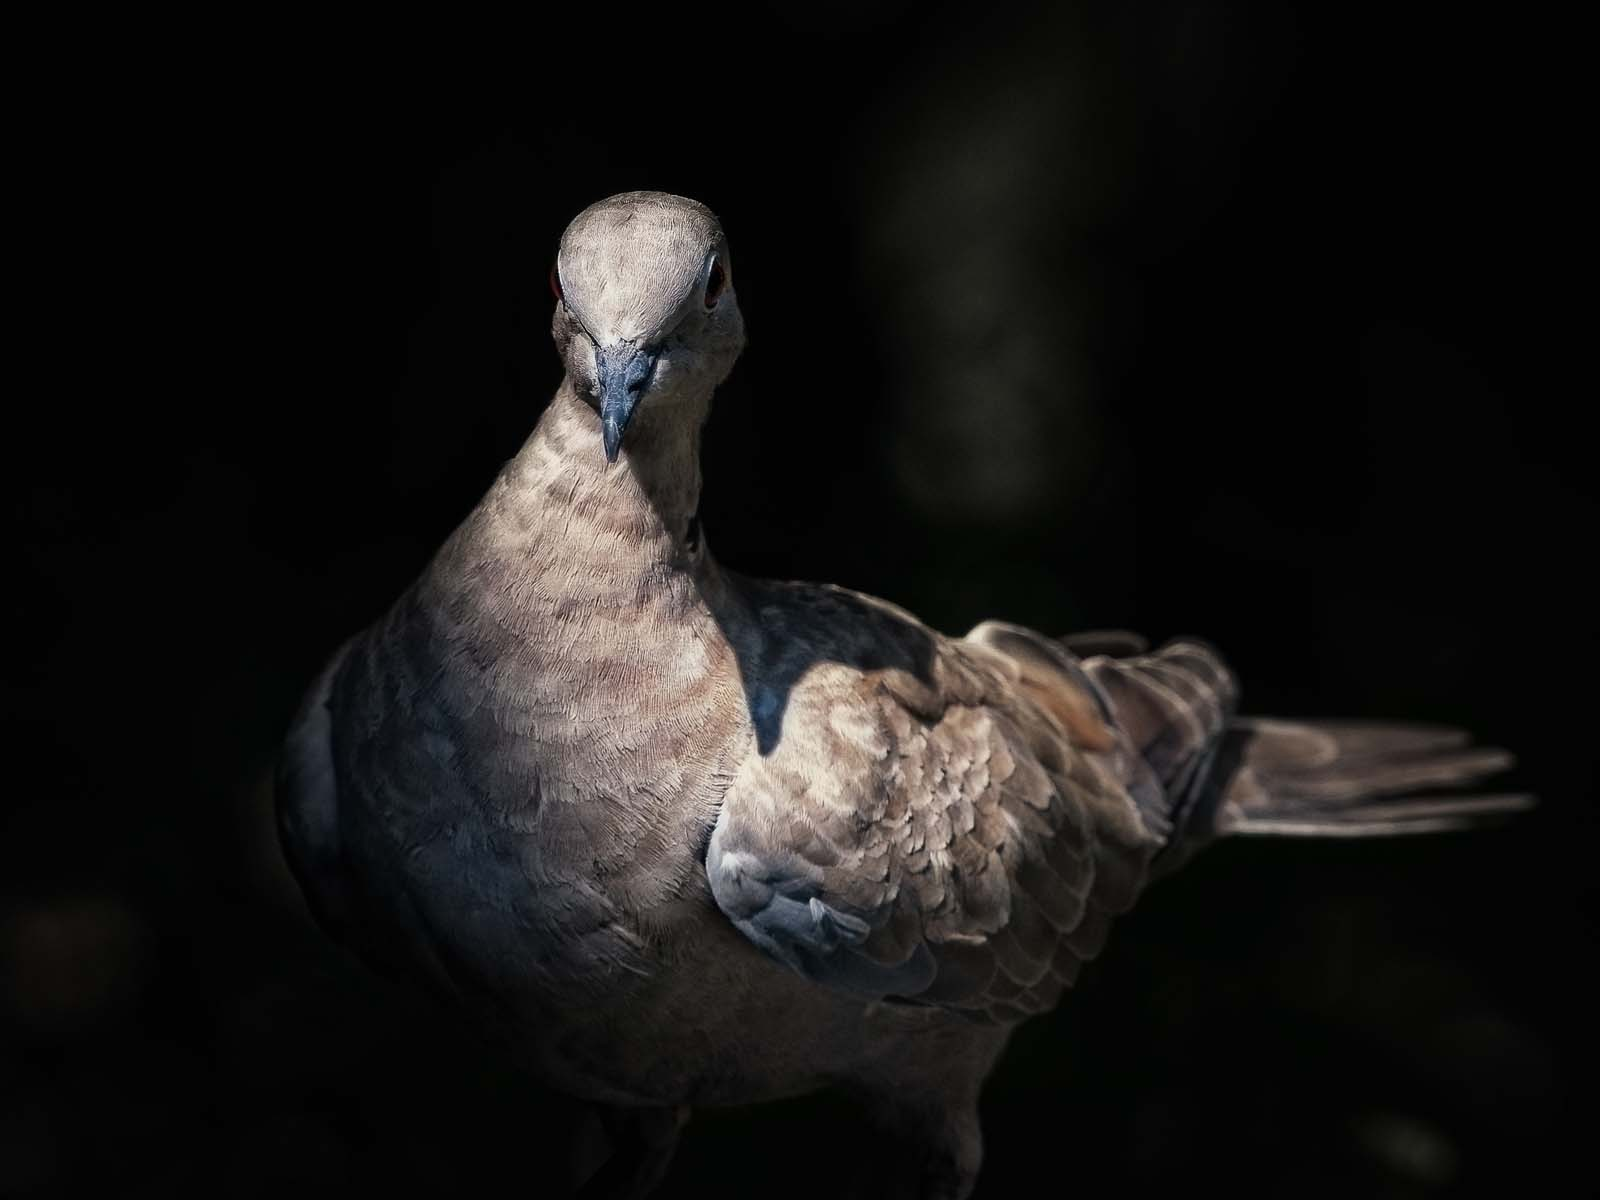 dove in dramatic lighting